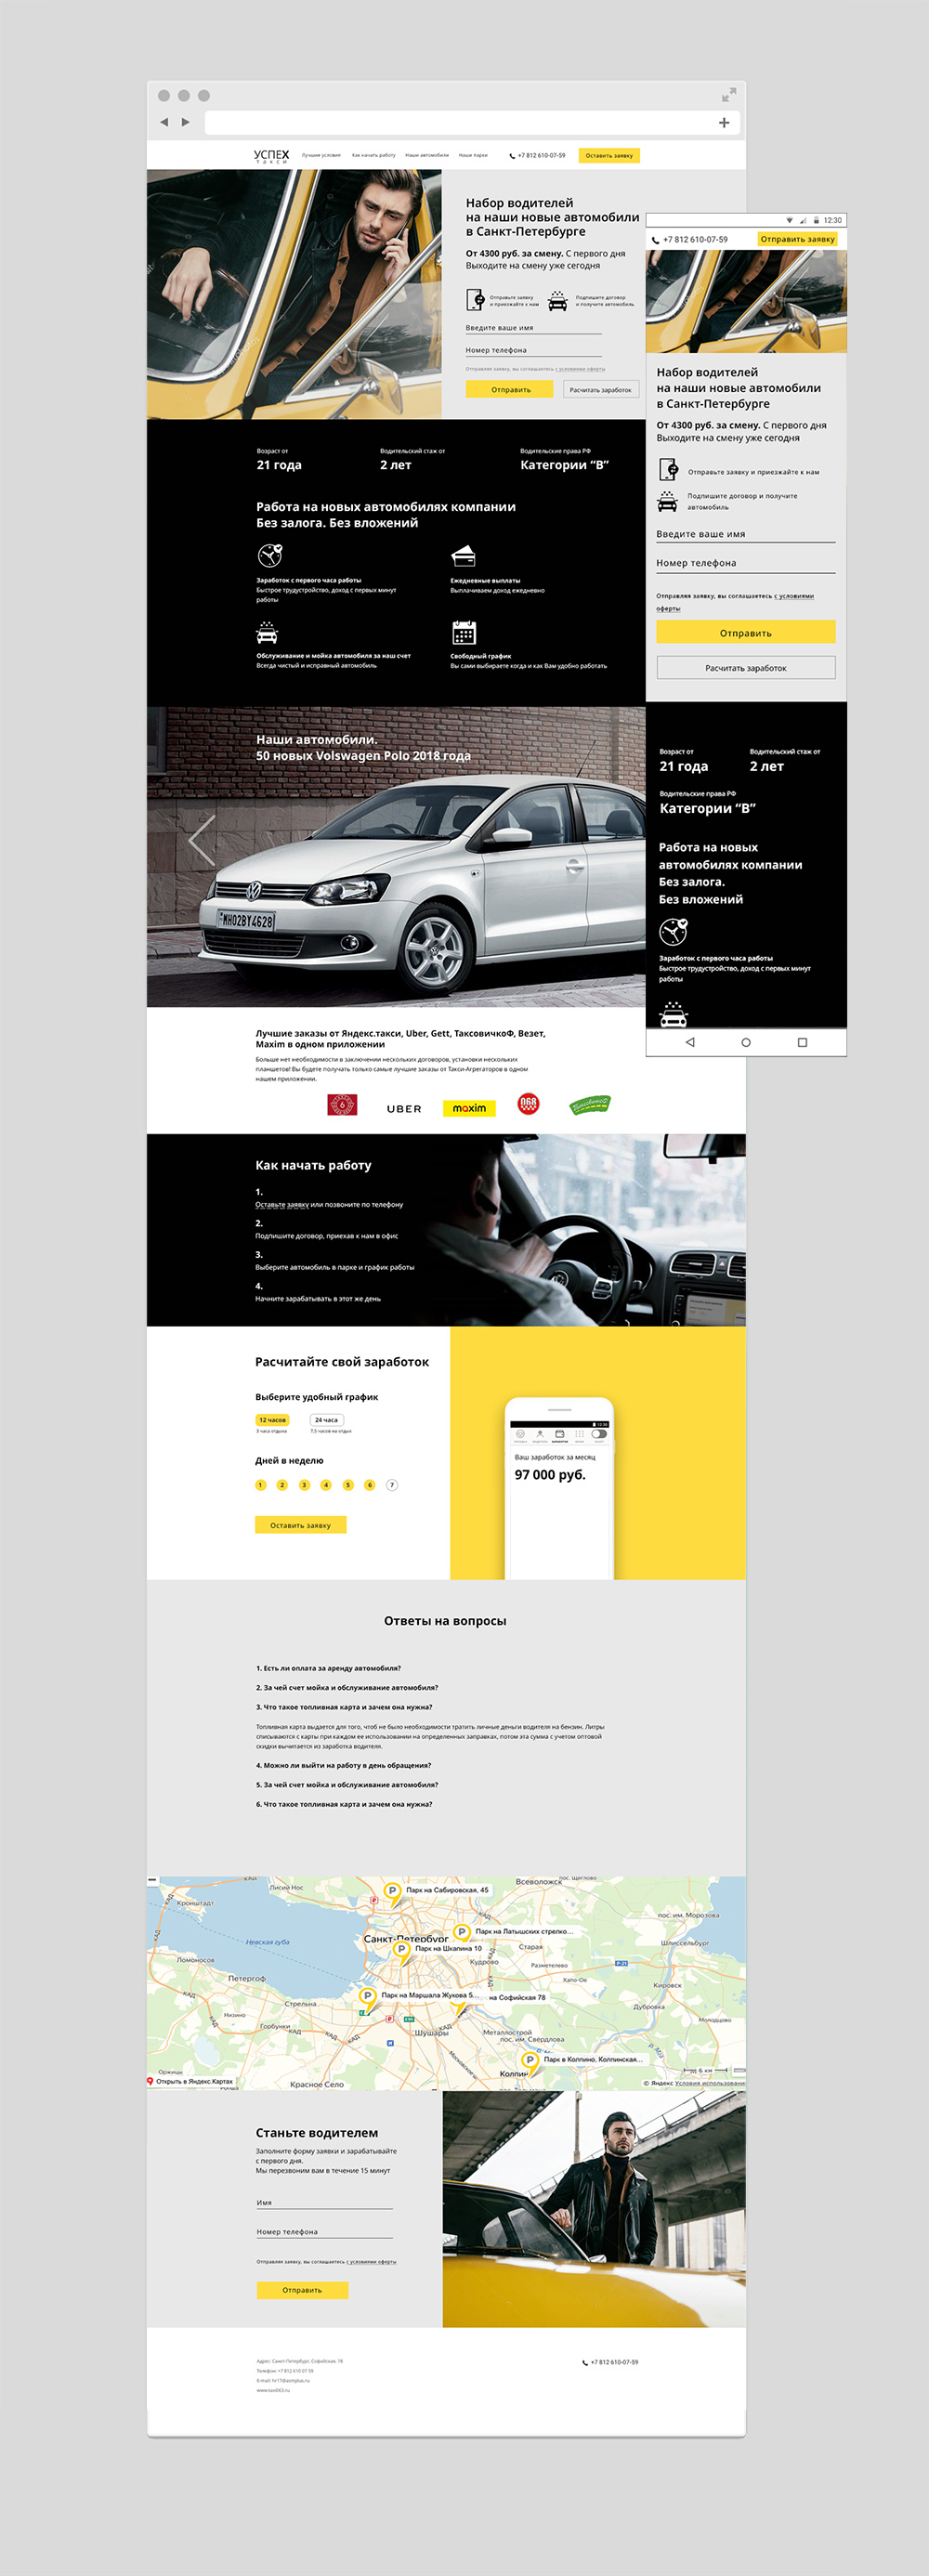 Посадочная страница такси